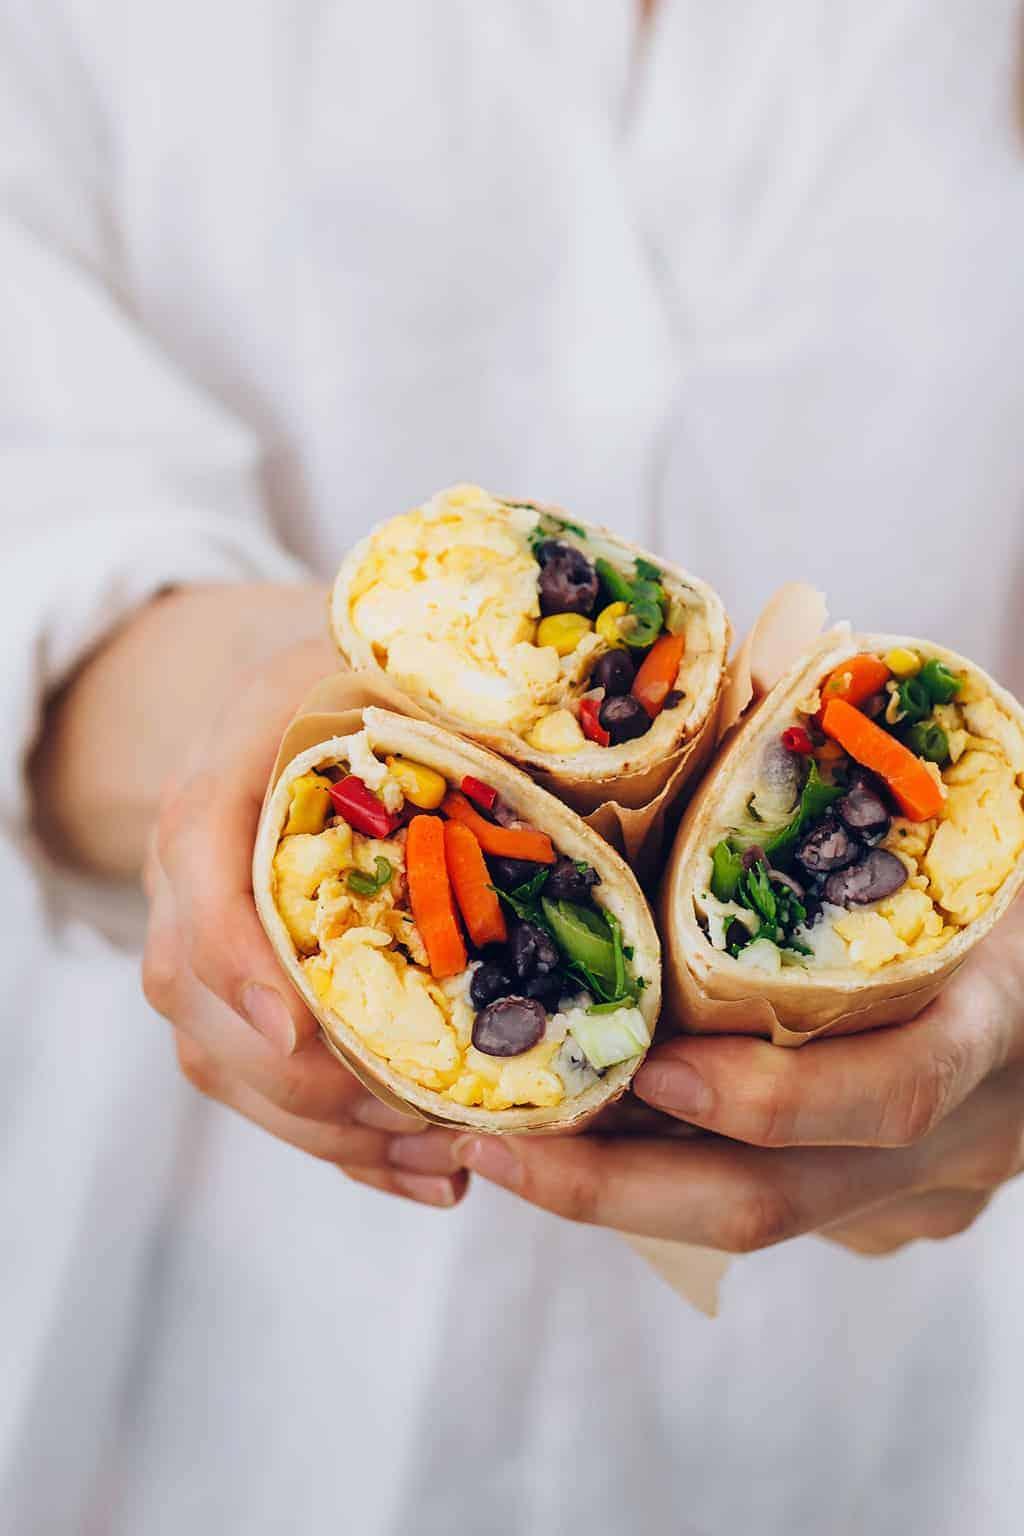 How to Make Freezer-Friendly Breakfast Burritos